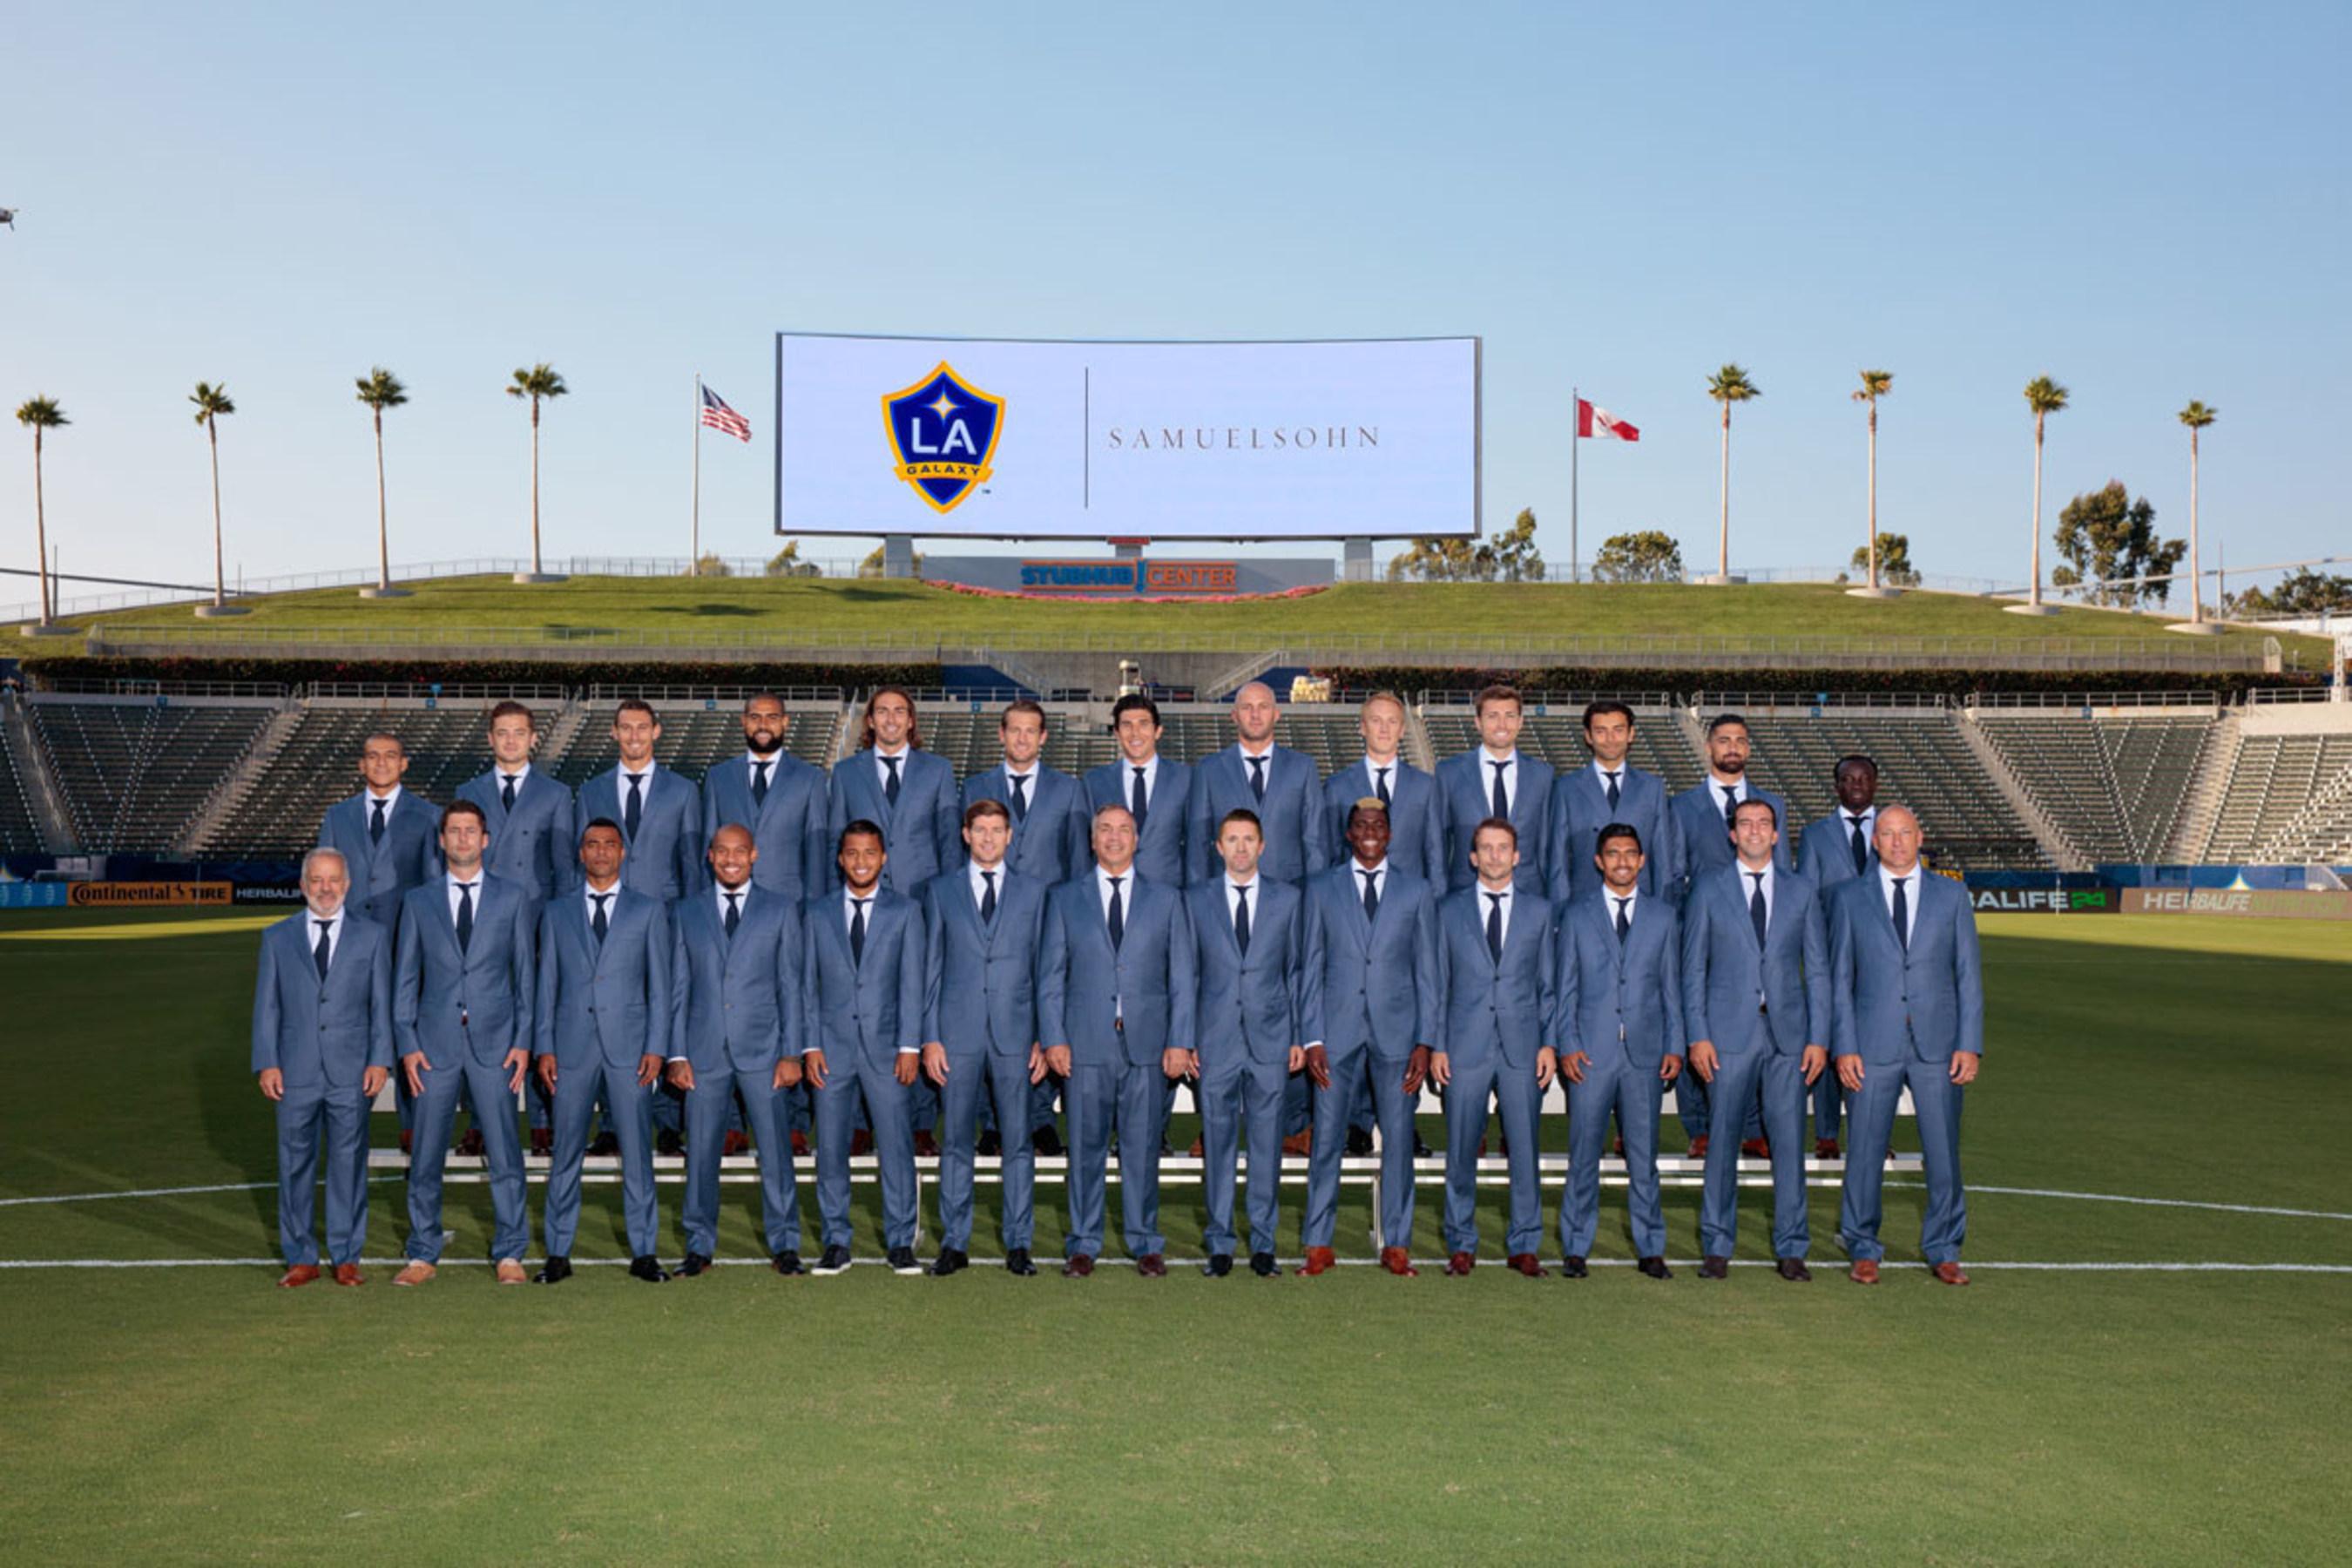 LA Galaxy in Samuelsohn Team Suit